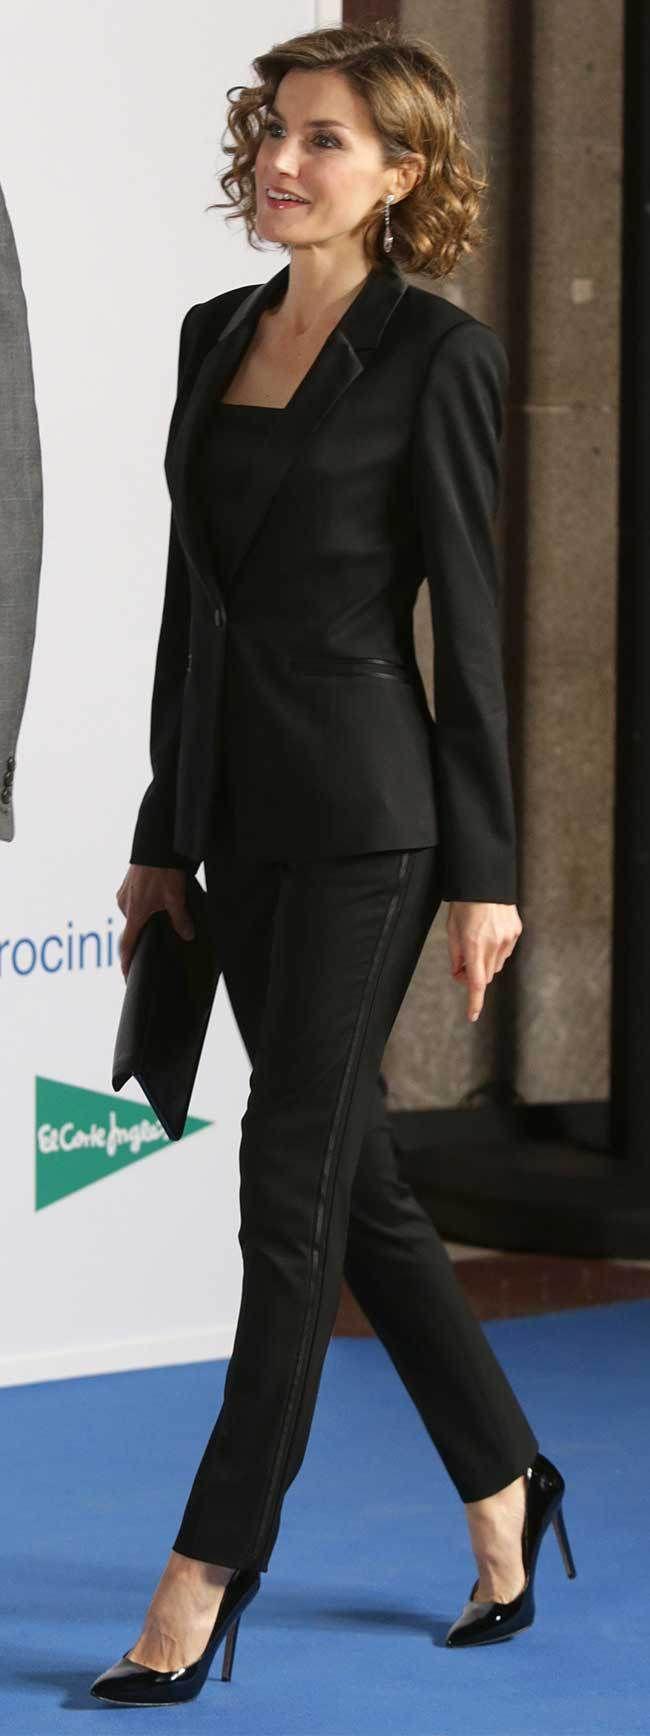 Queen Letizia - Hugo Boss Runway Edition smoking. Magrit shoes. Yanes earrings.